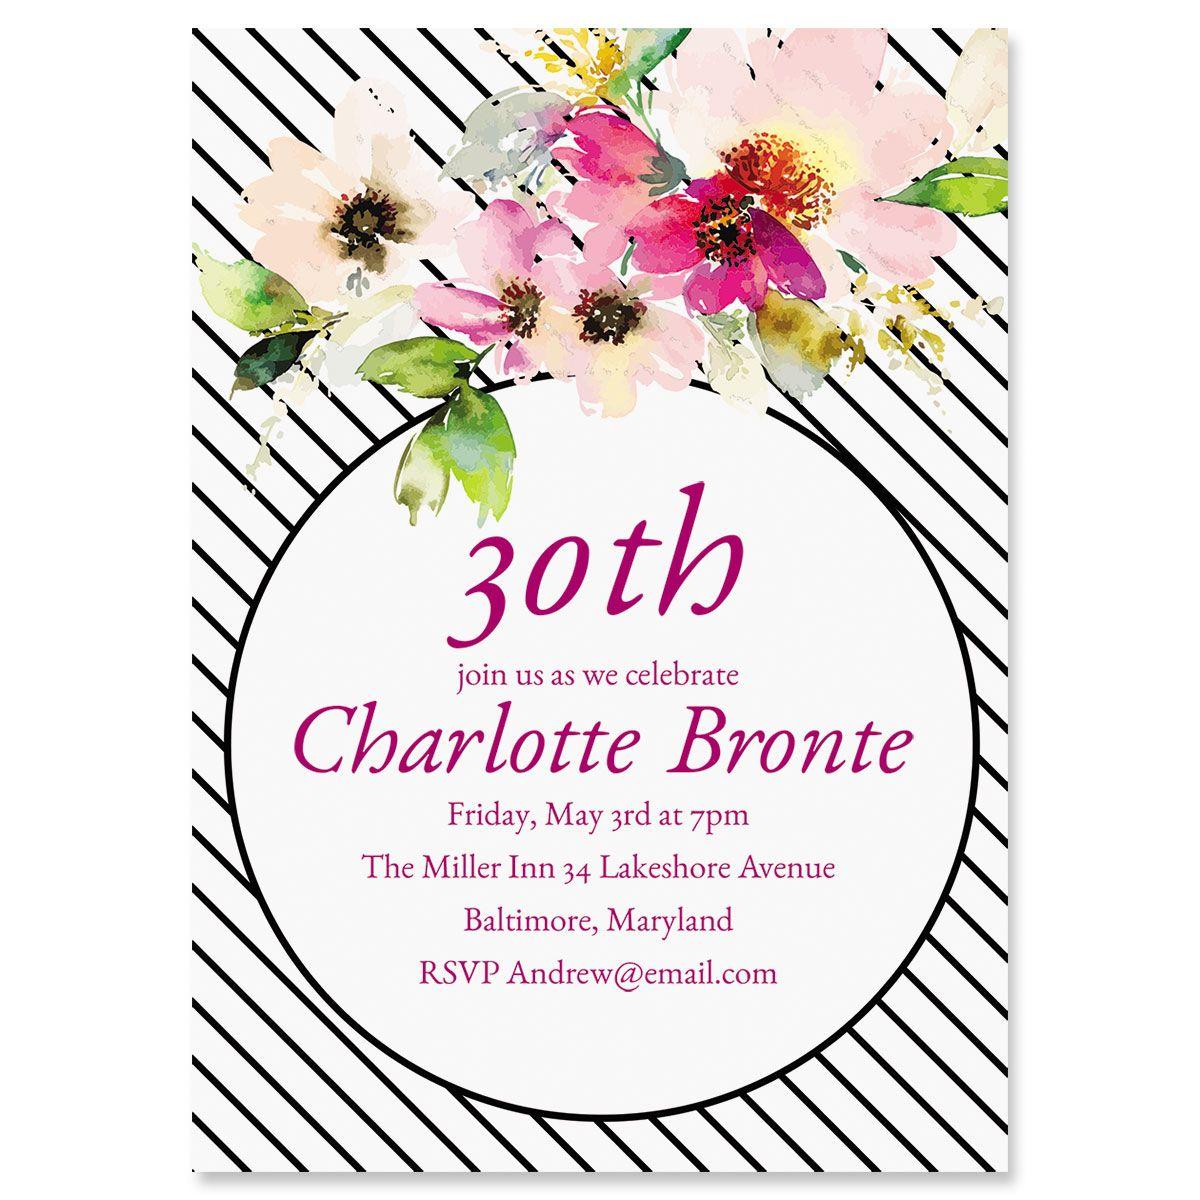 Personalized Charmed Milestone Invitations